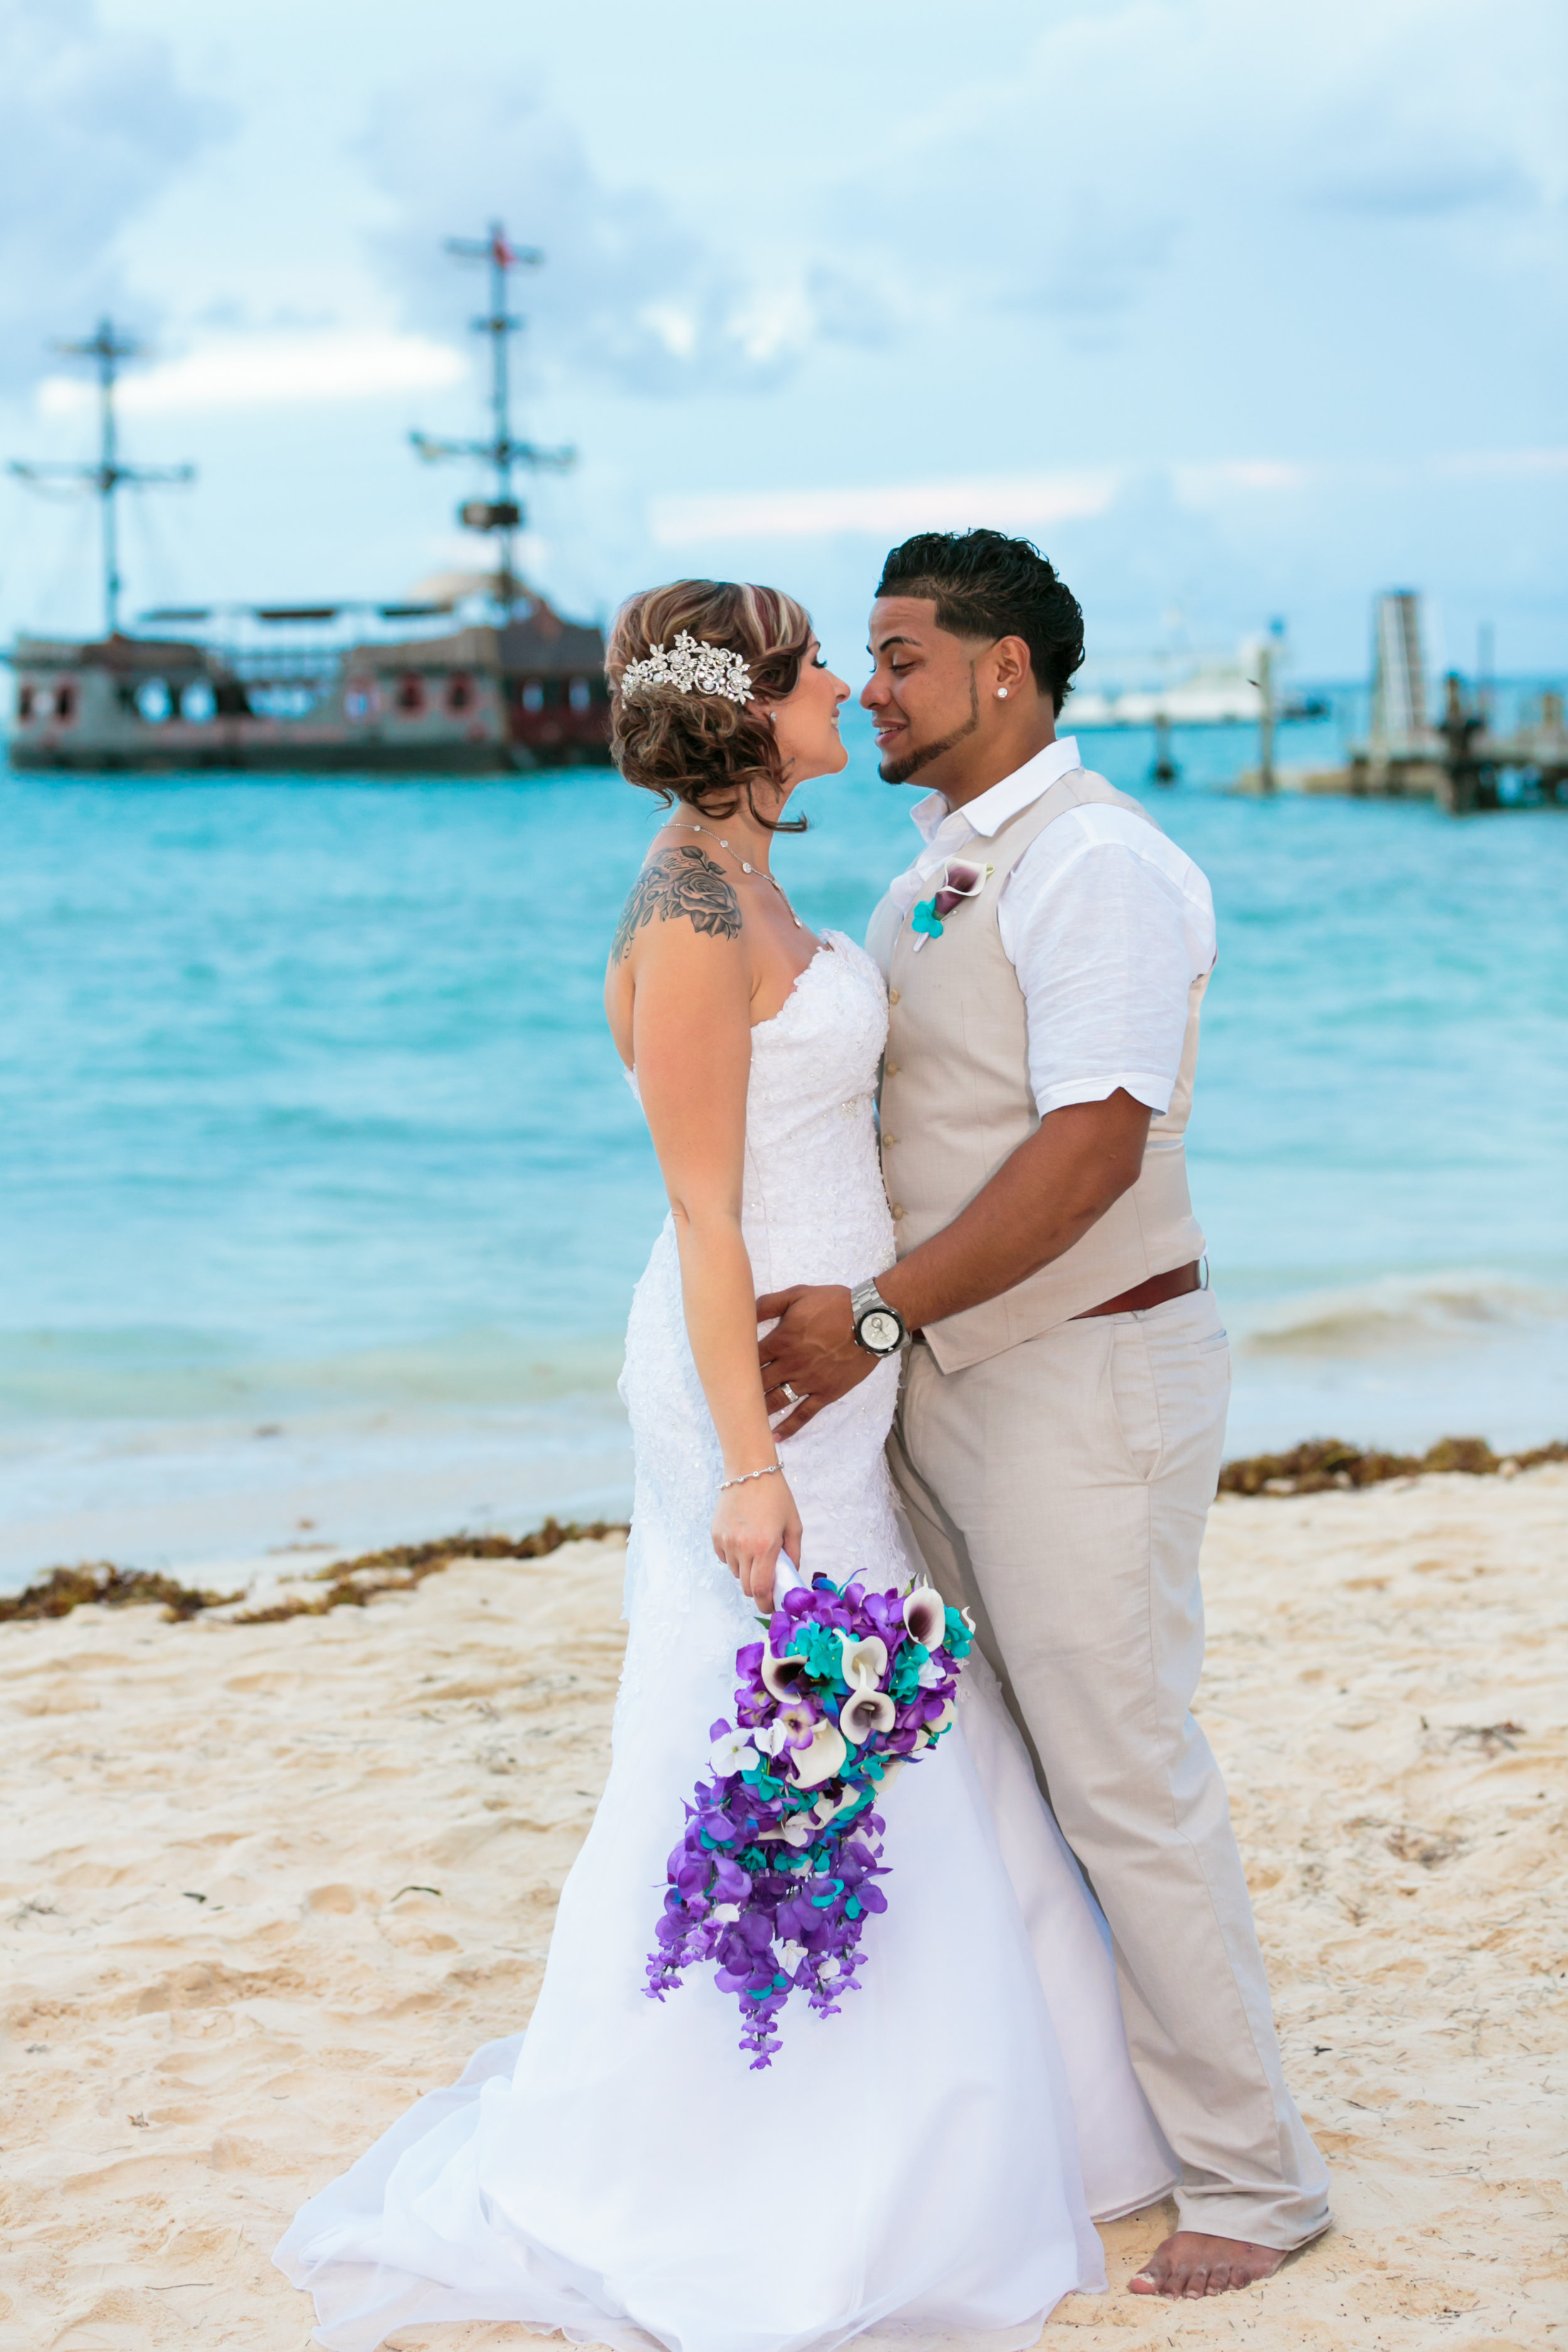 Ashley & Nathaniel's Wedding